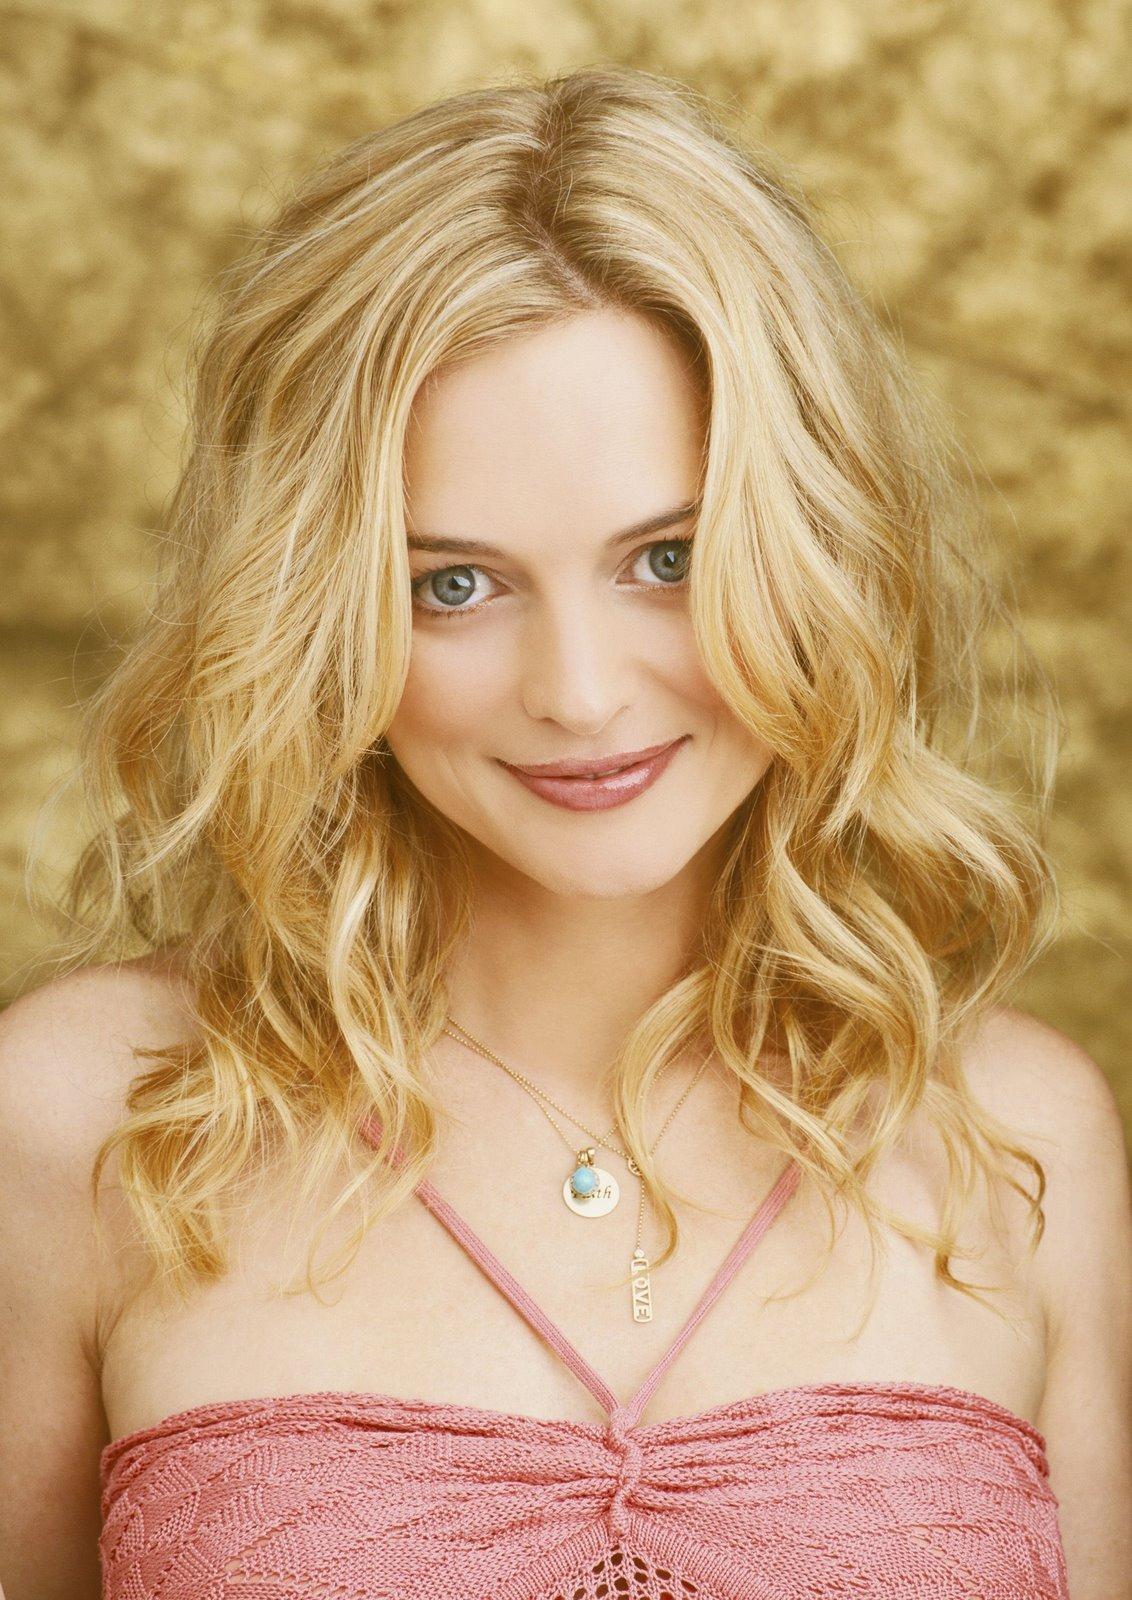 Celebrity Images: Heather Graham